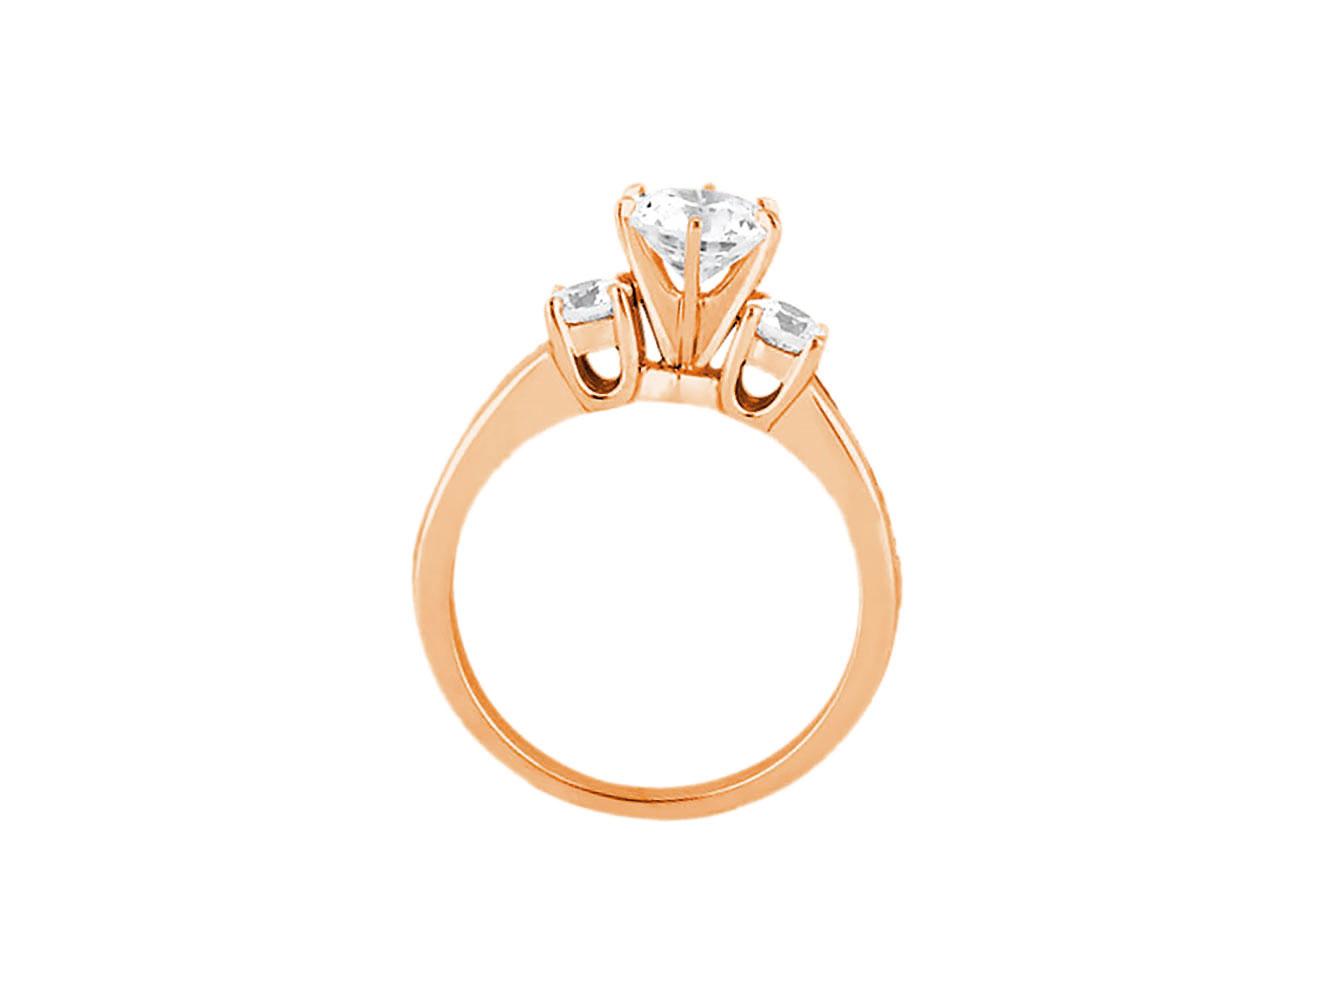 1-10-Quilates-Redondo-Princesa-Anillo-de-Compromiso-Diamante-Corte-10-Oro-Kl-I1 miniatura 6